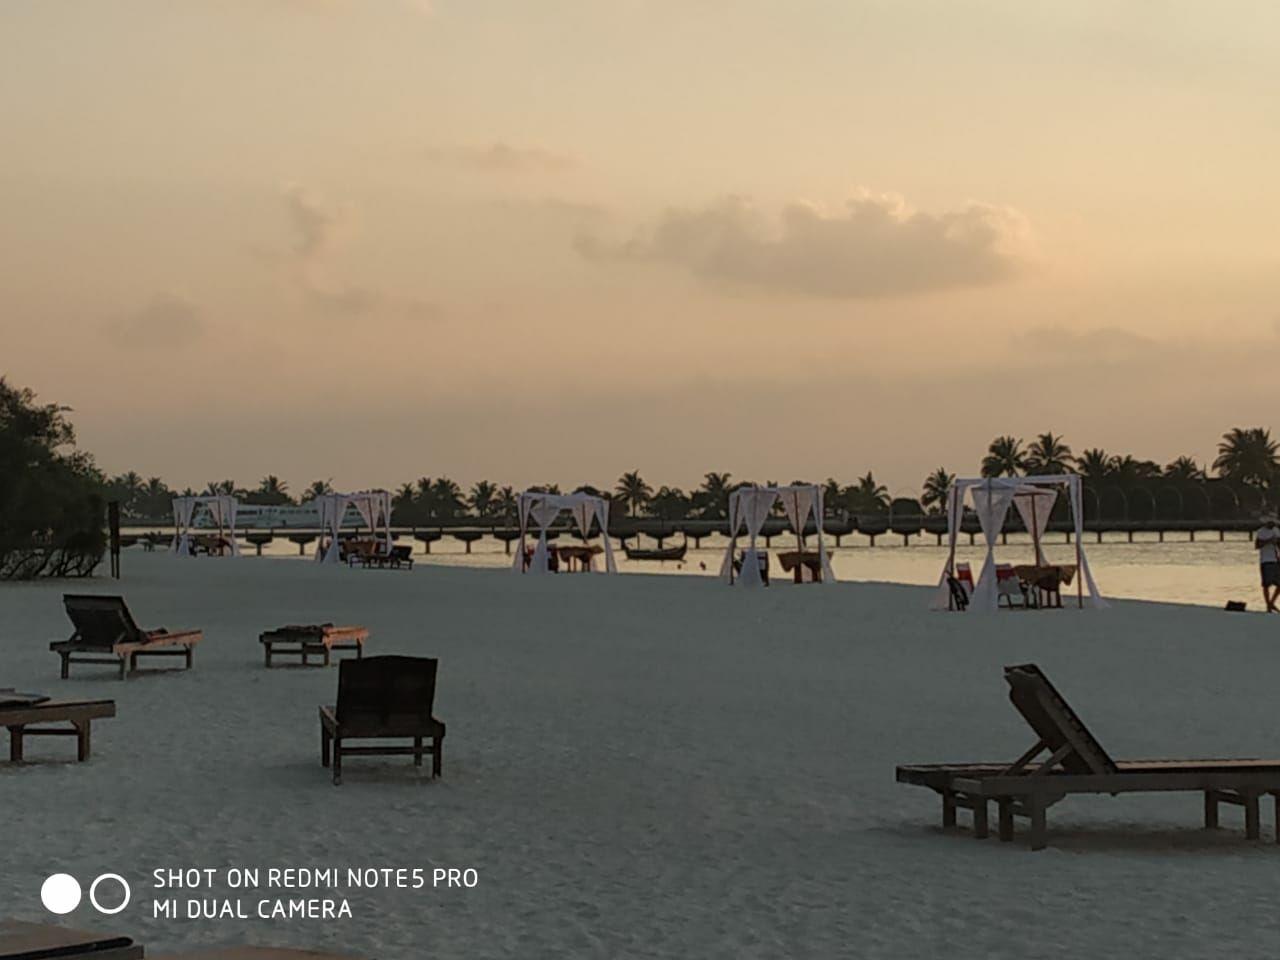 Photo of Maldive Islands By Rahul Srivastava